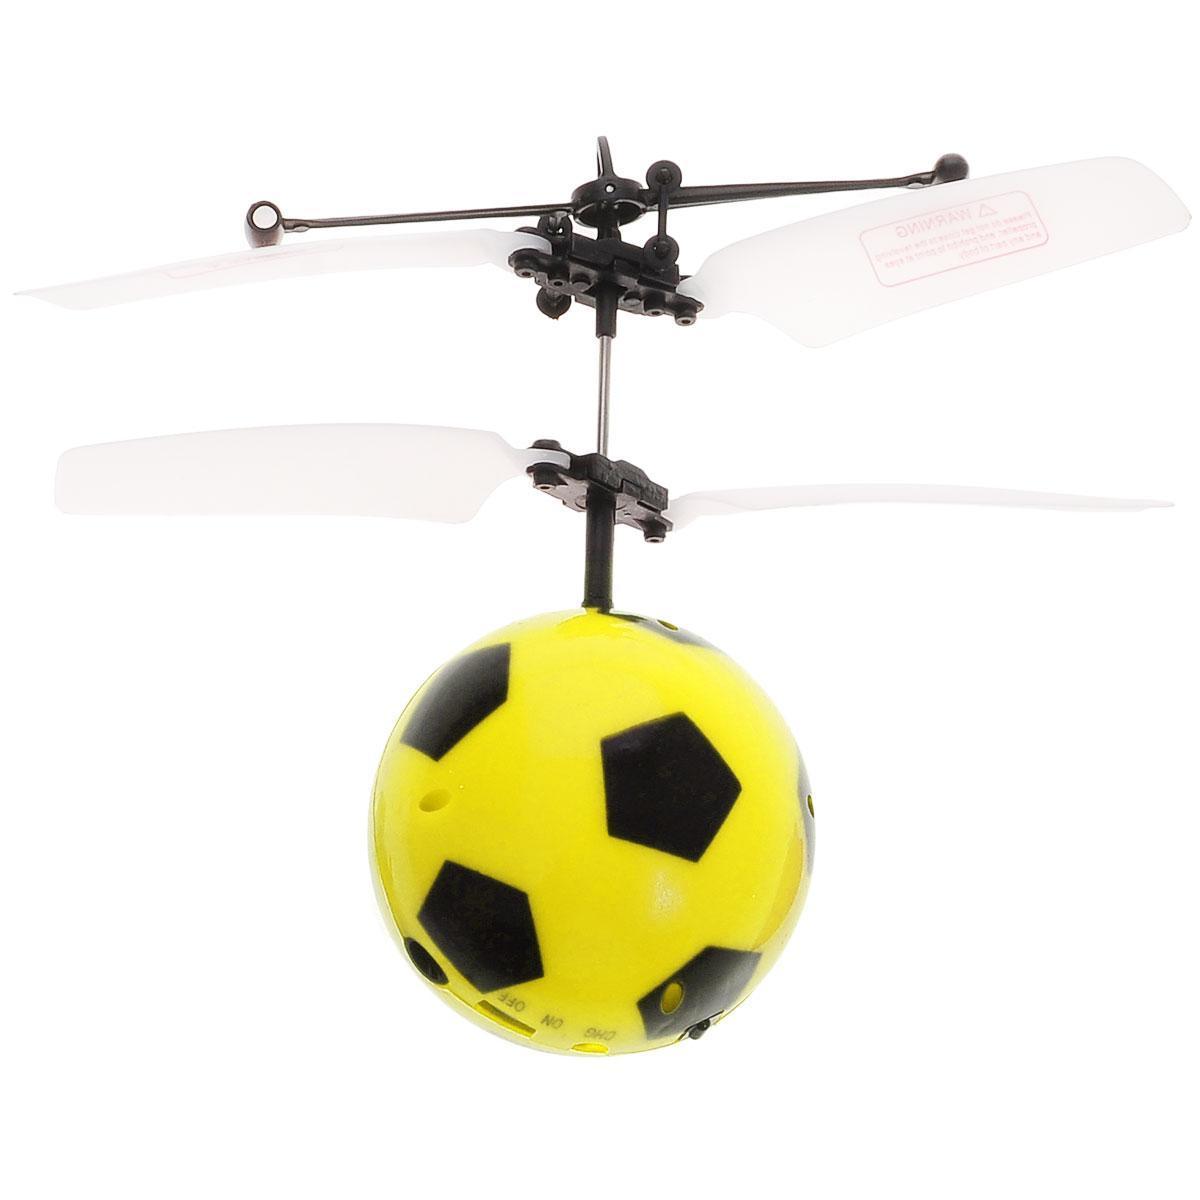 Минифлаер Футбольный мяч BALBI FB-001-Y, цвет: желтый